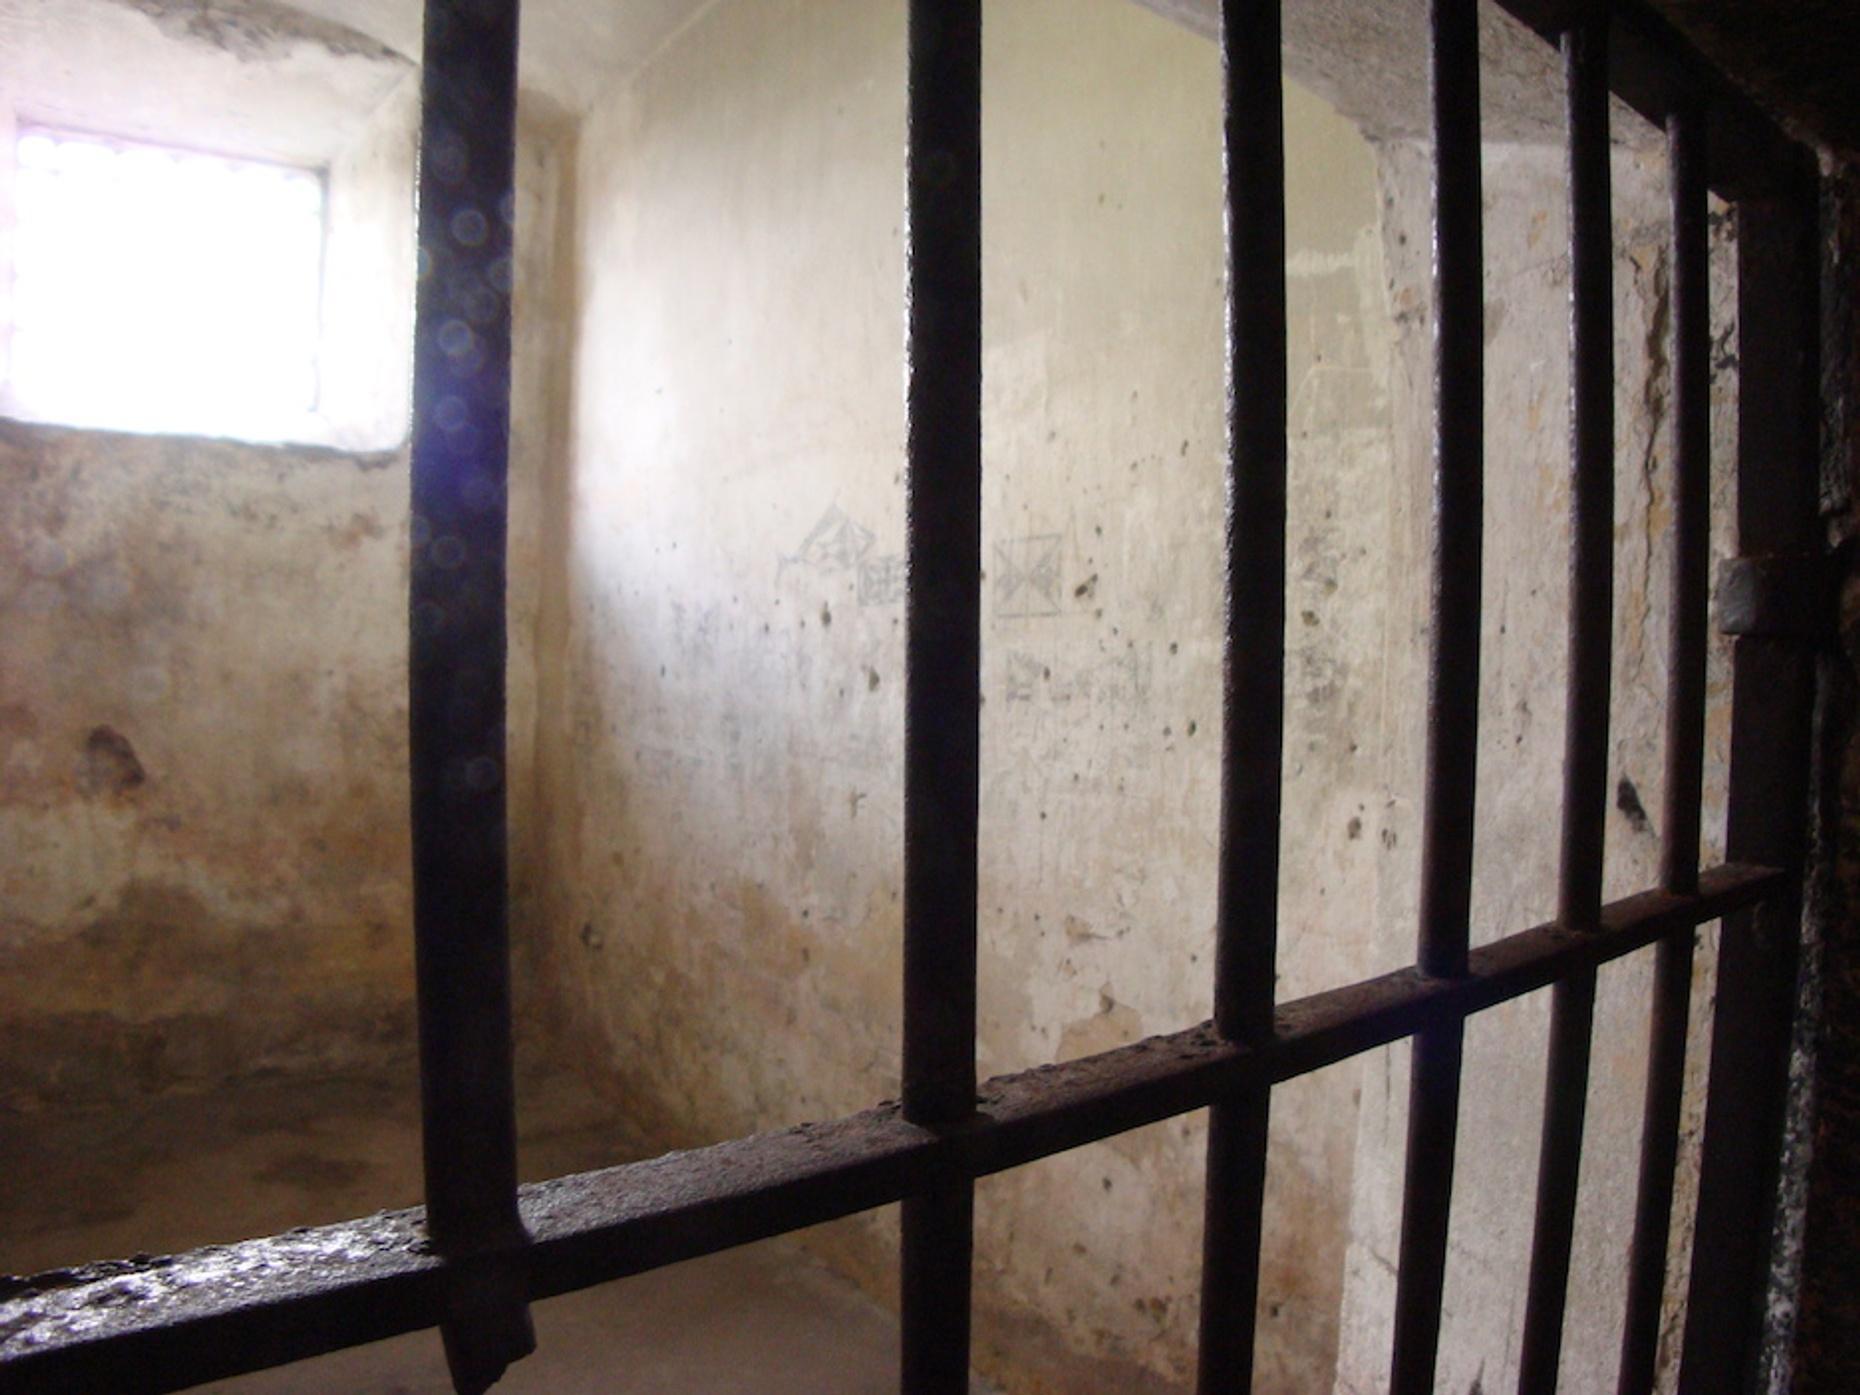 Jail Break Escape Game in Pensacola